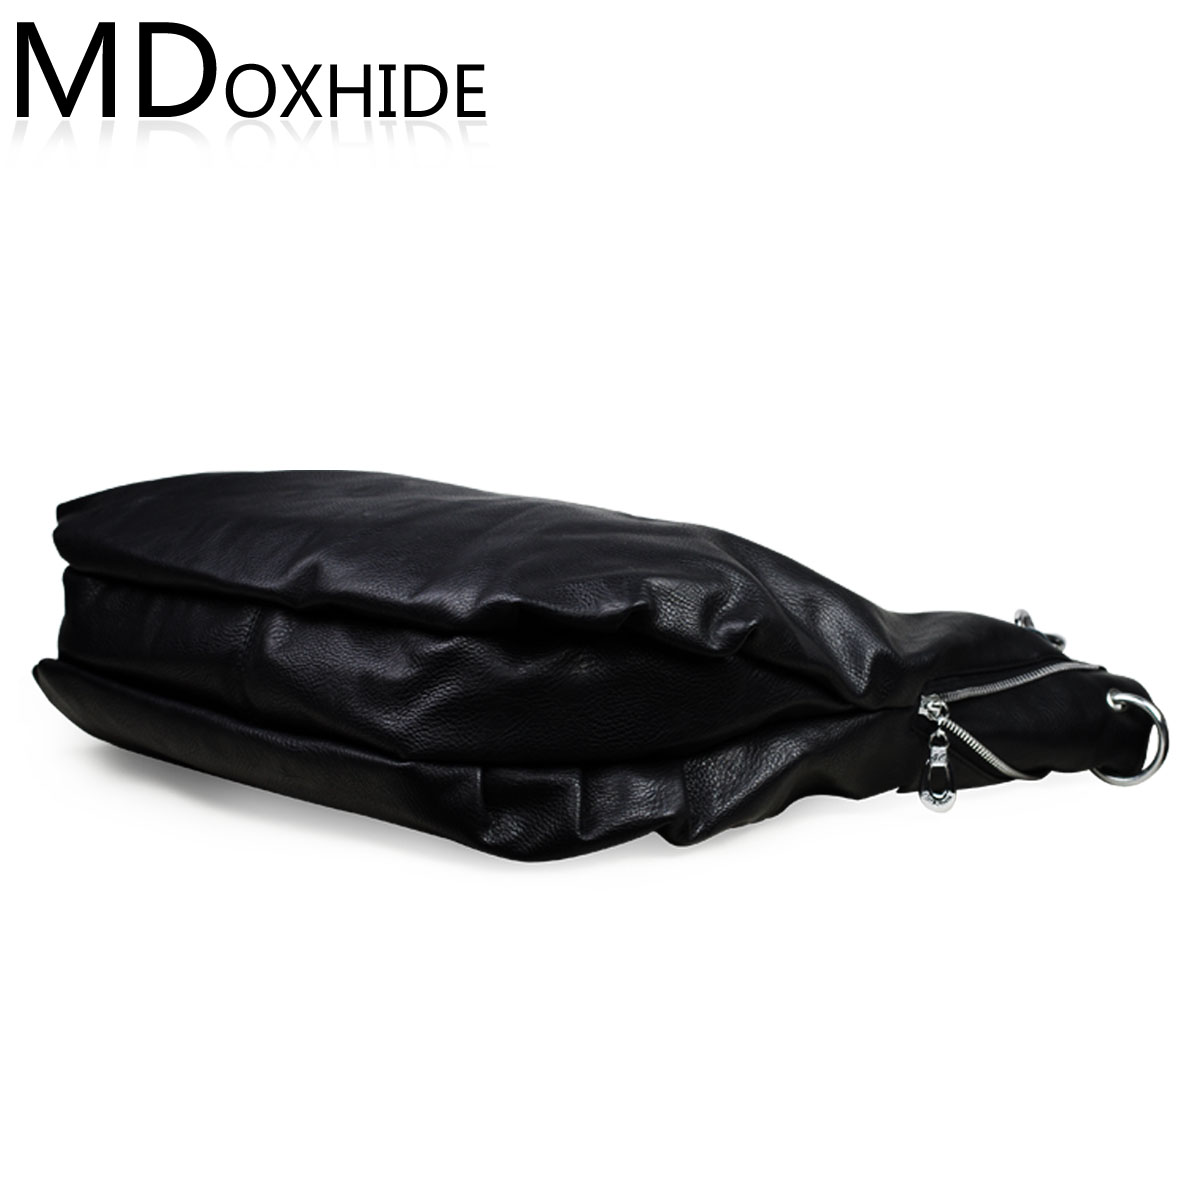 Сумка Mdoxhide 1064# 2011